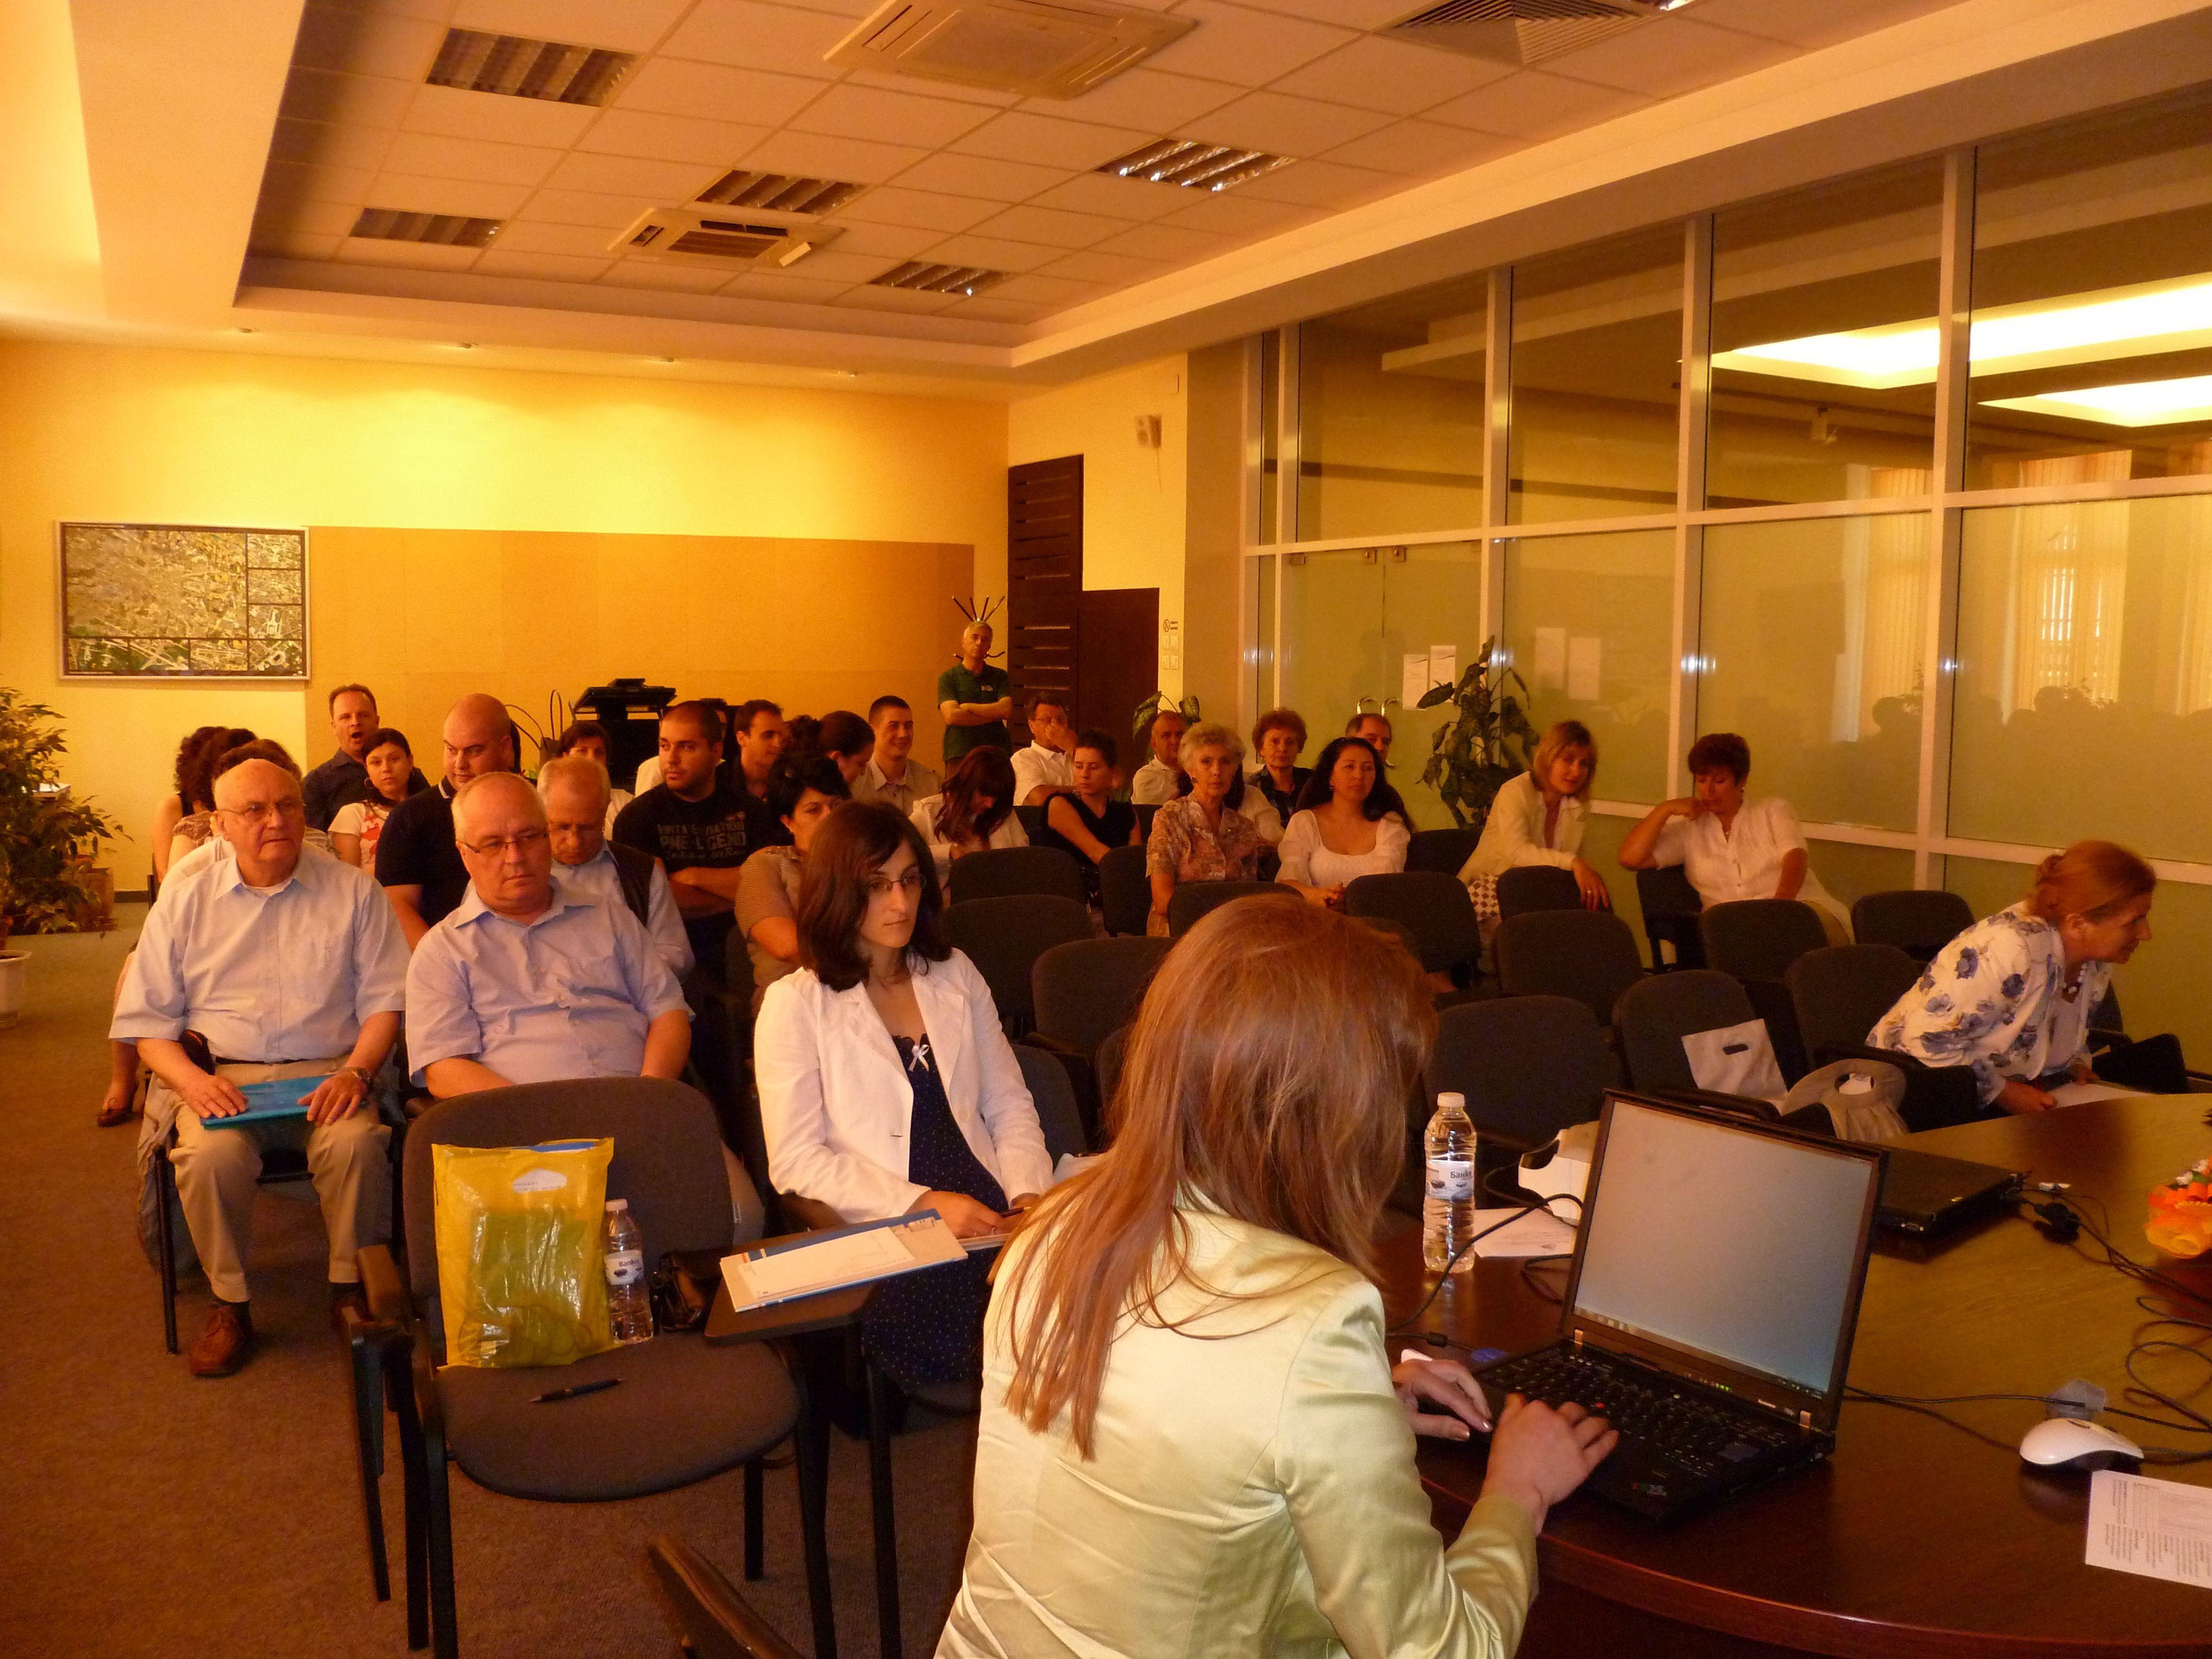 Meeting-Photo-4.JPG